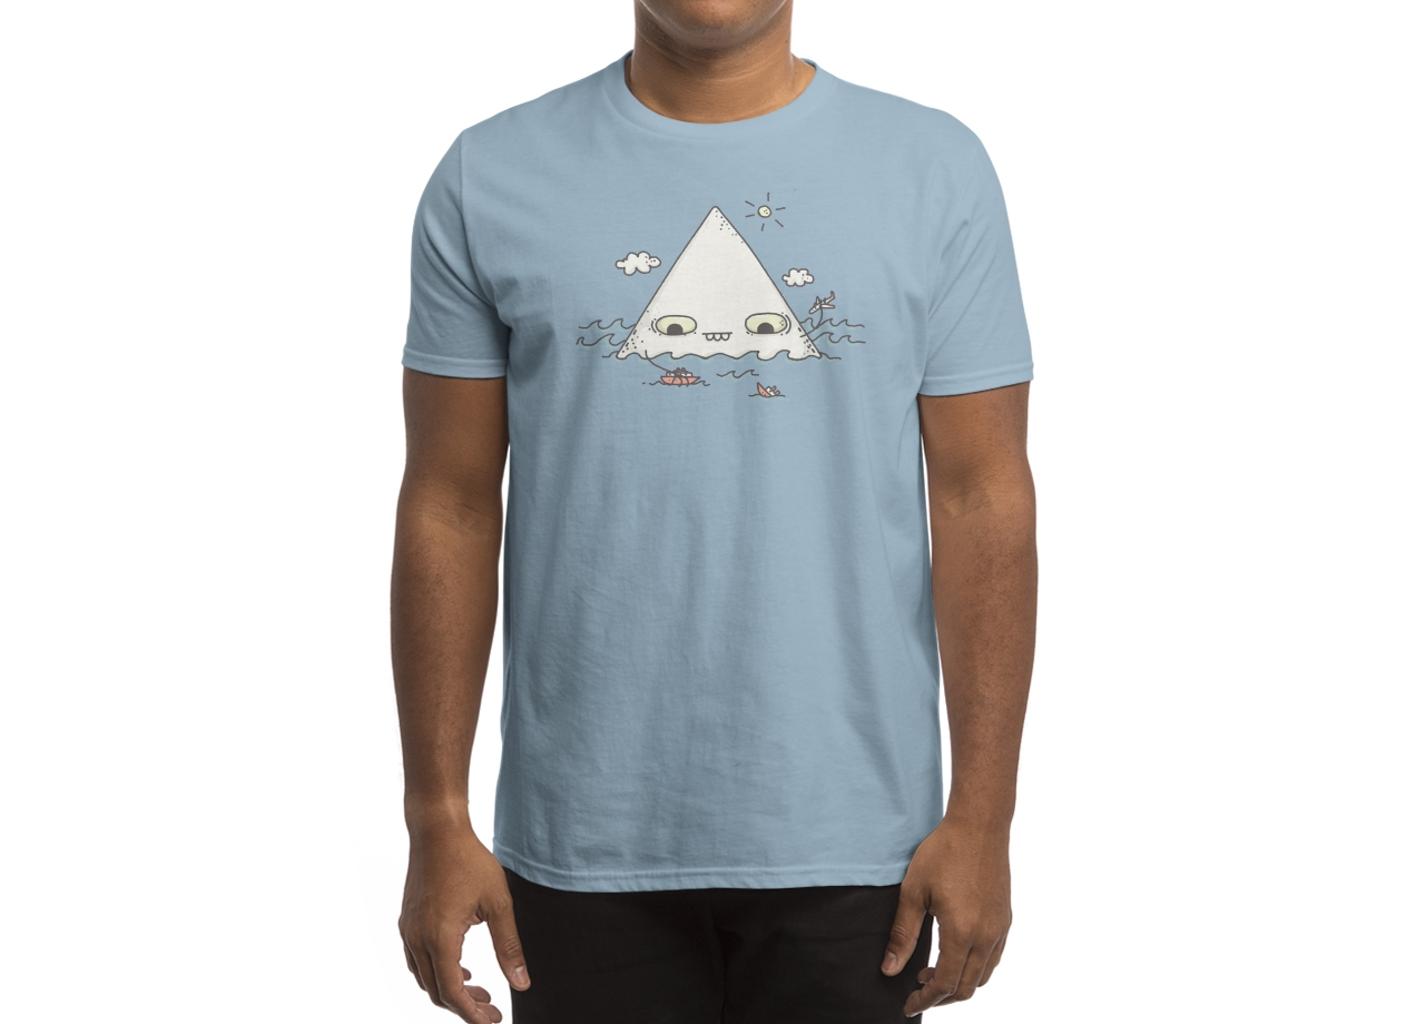 Threadless: The Bermuda Triangle